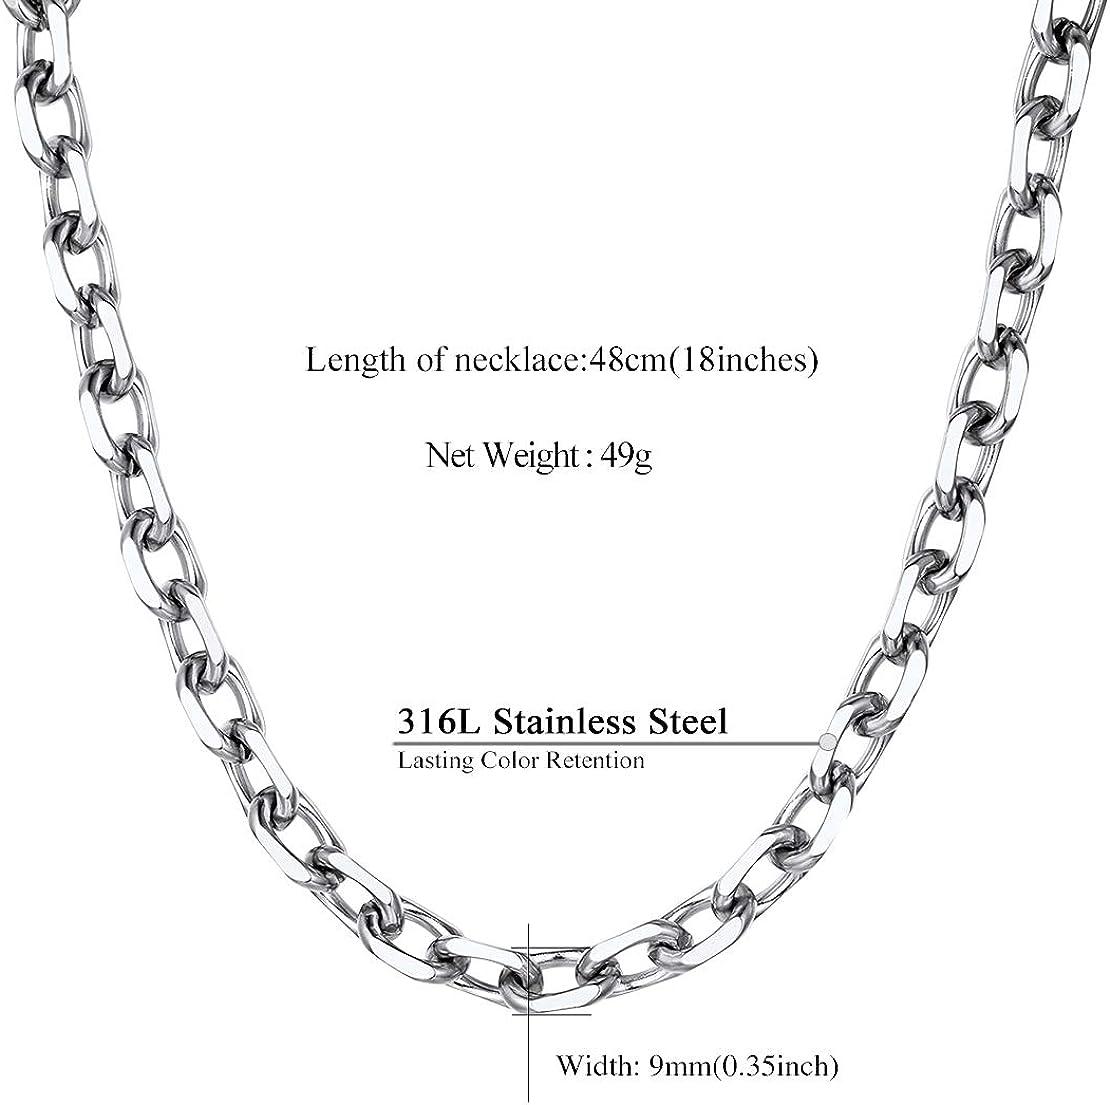 Findings Chain Pendant Chain Charm Chain 18inch Chain 5-18 inch Chains Petite Oval Link Cable Chains Oval Link Chains